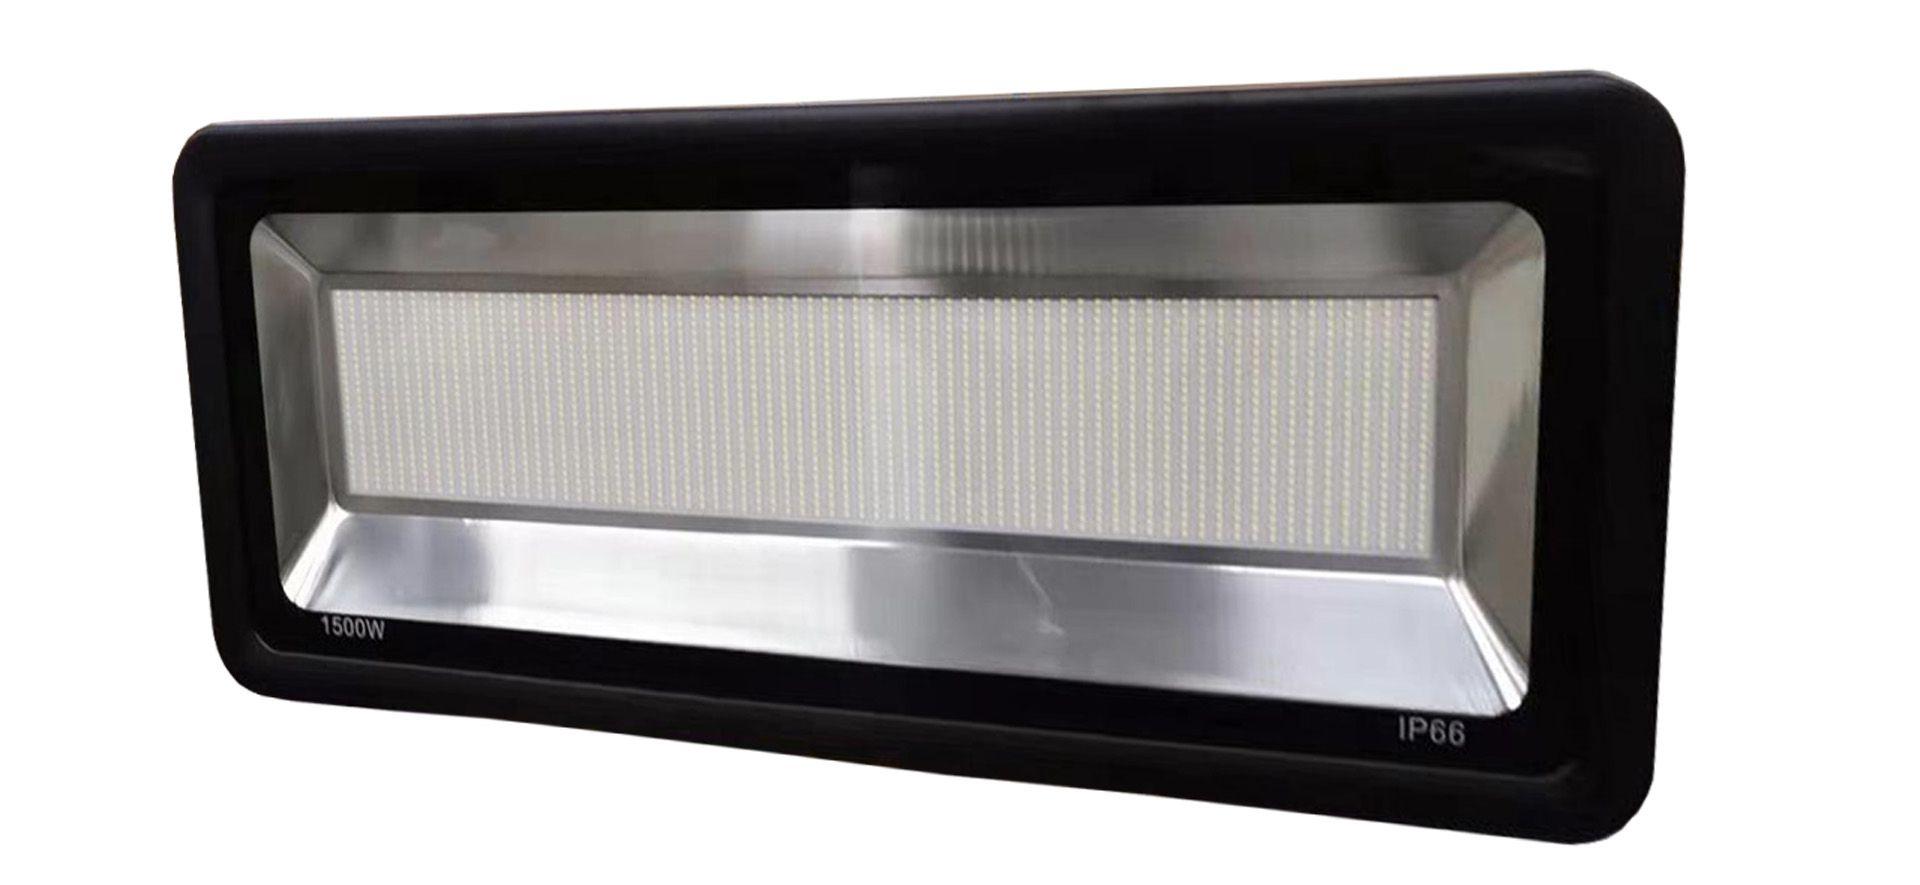 Refletor projetor smd led holofote 1500w Ultra Potente Branco frio IP66